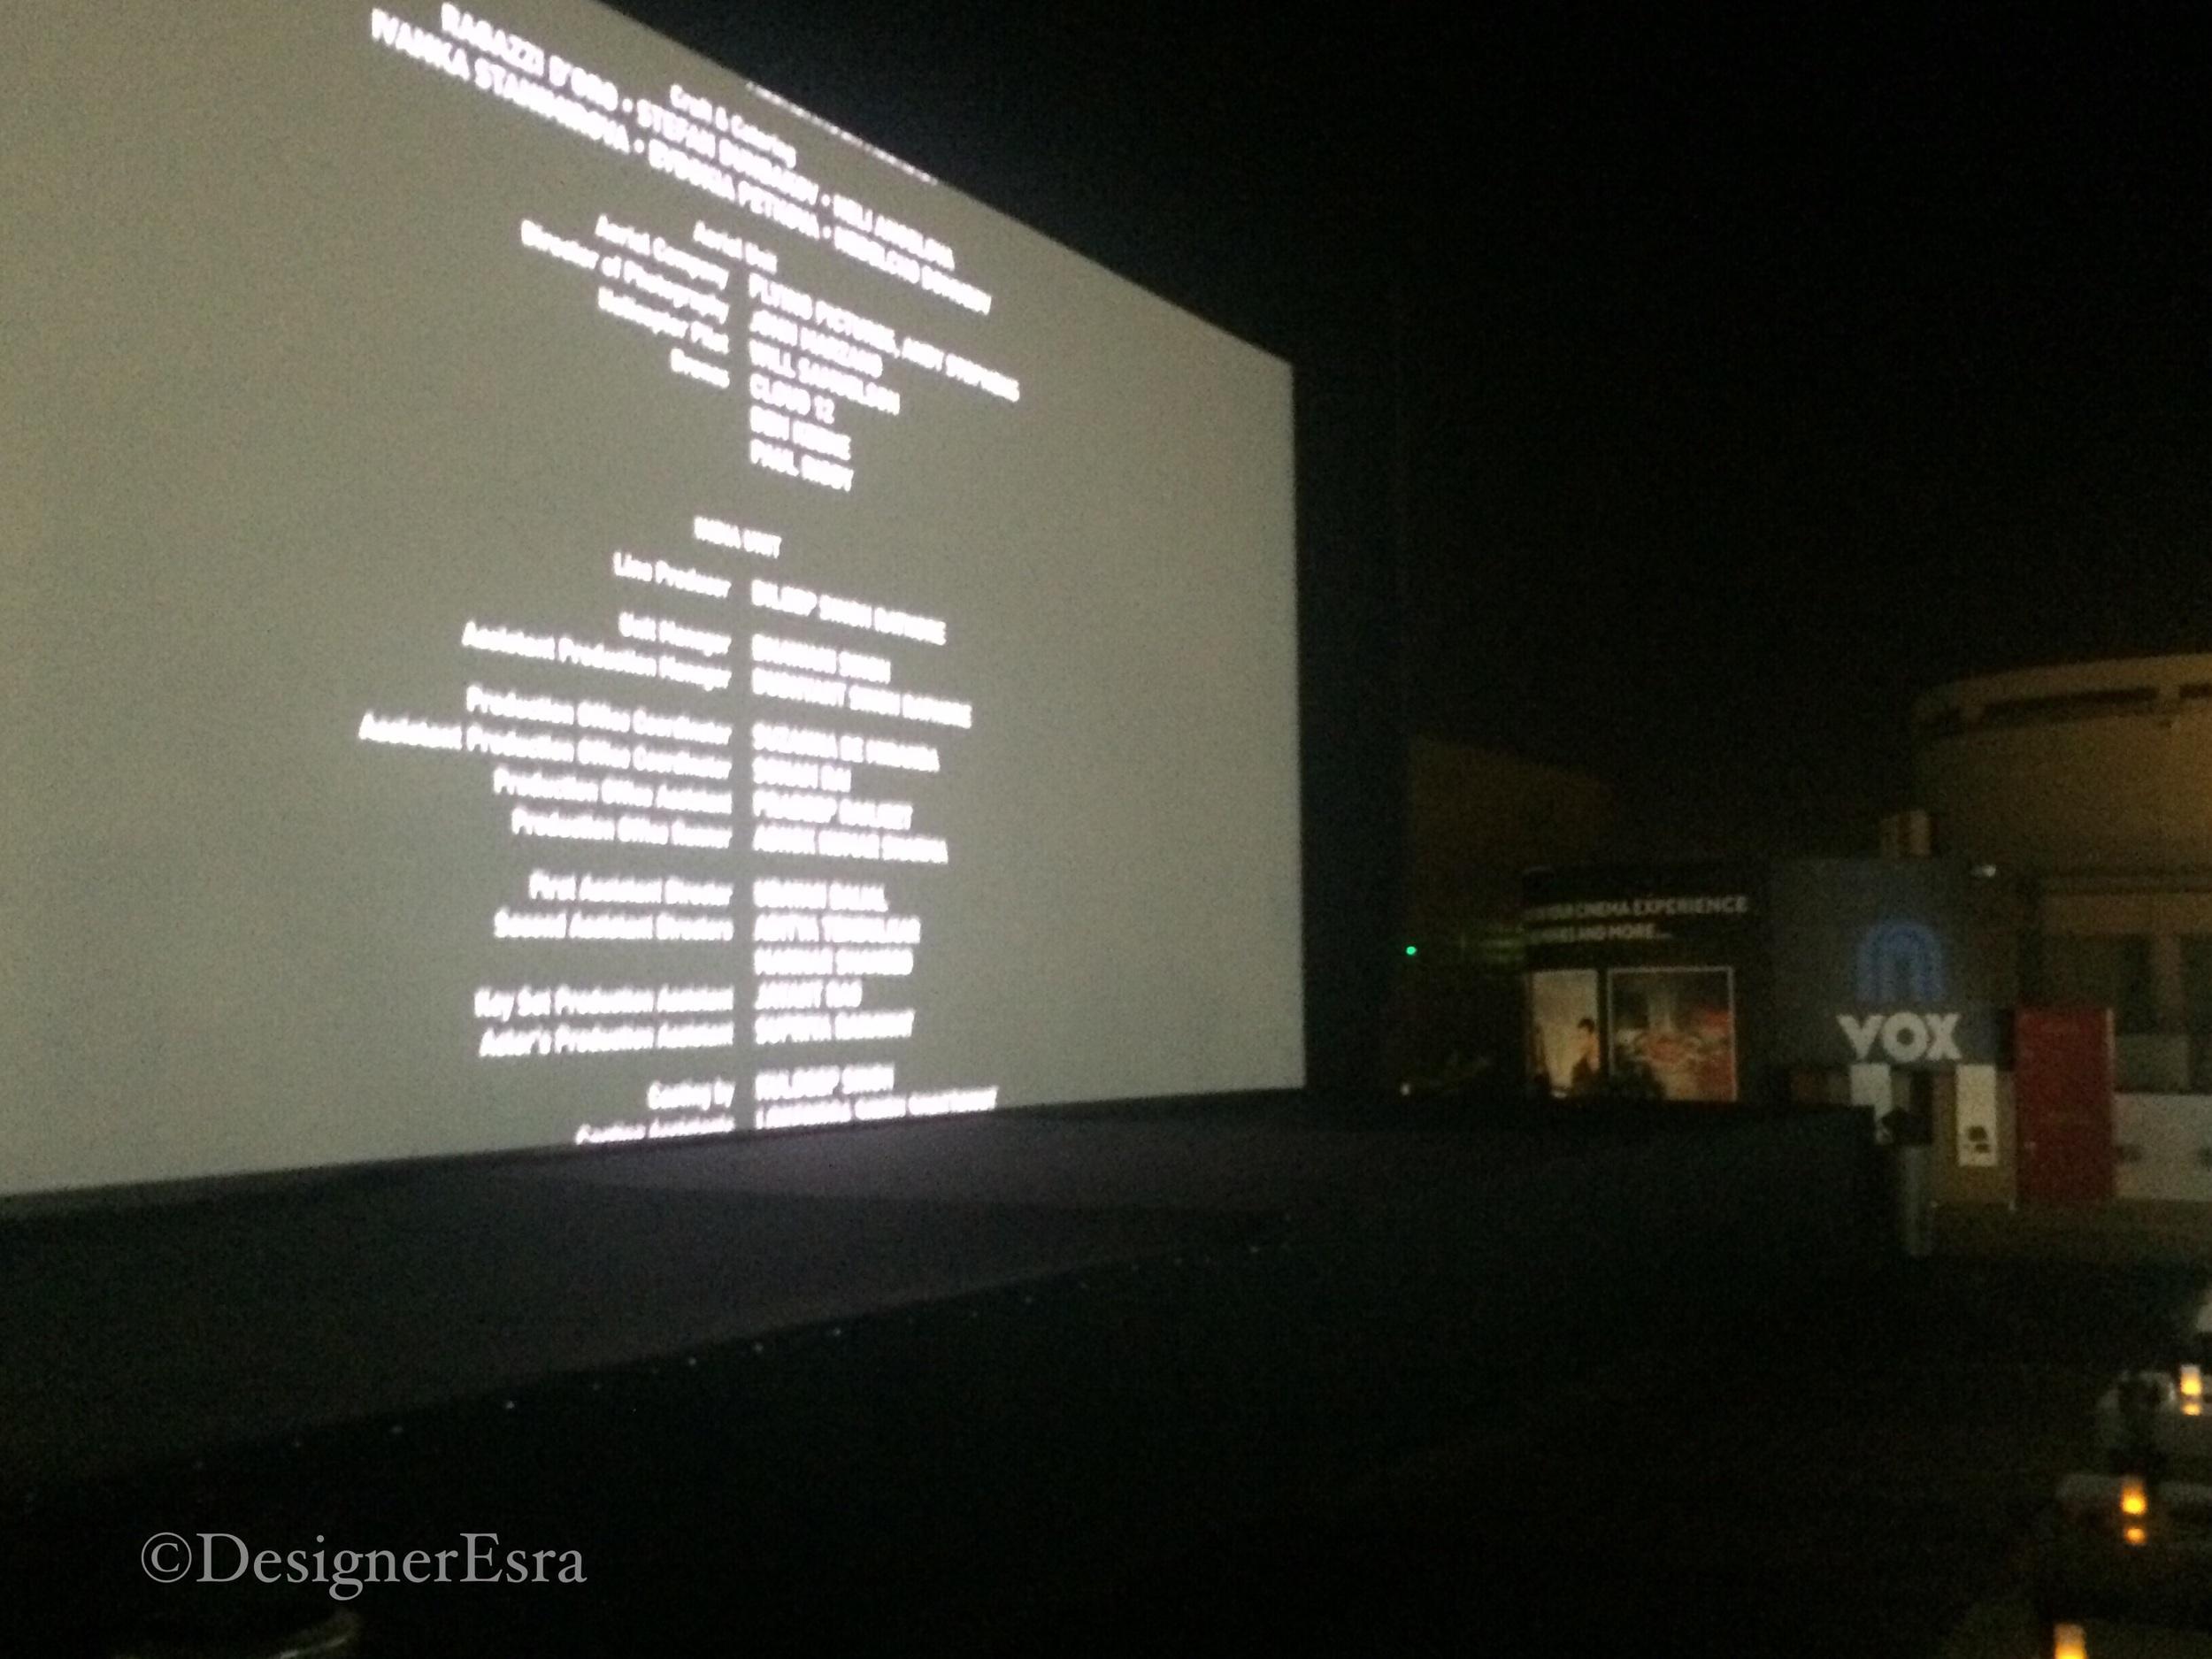 Vox Cinemas Dubai